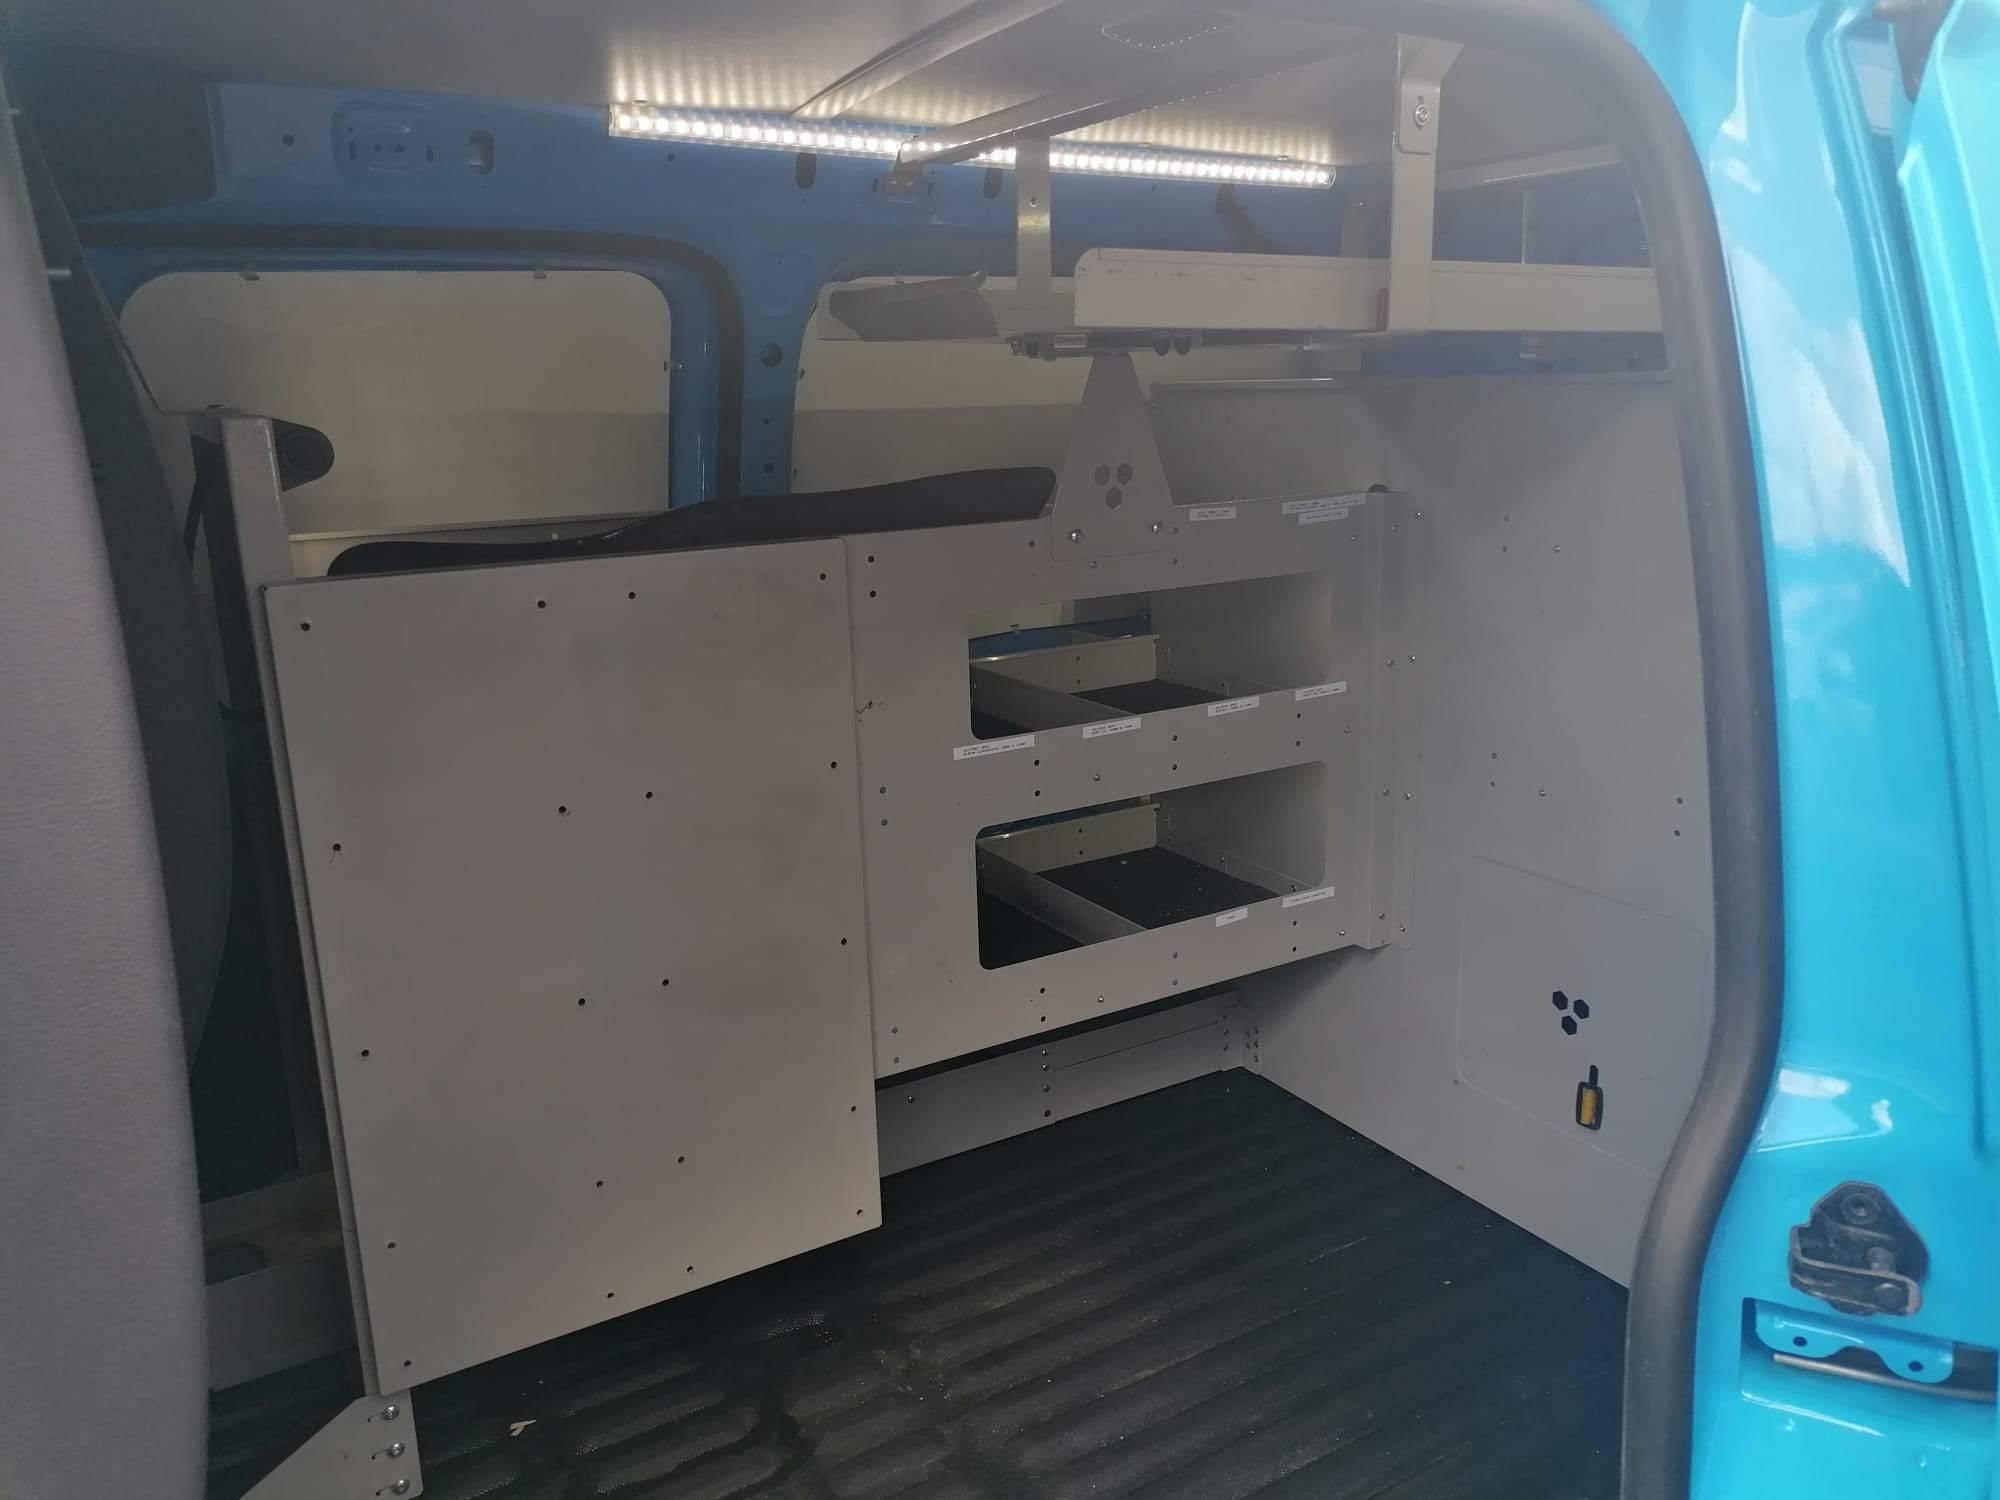 2013 Volkswagen Caddy TDI C20 Startline full